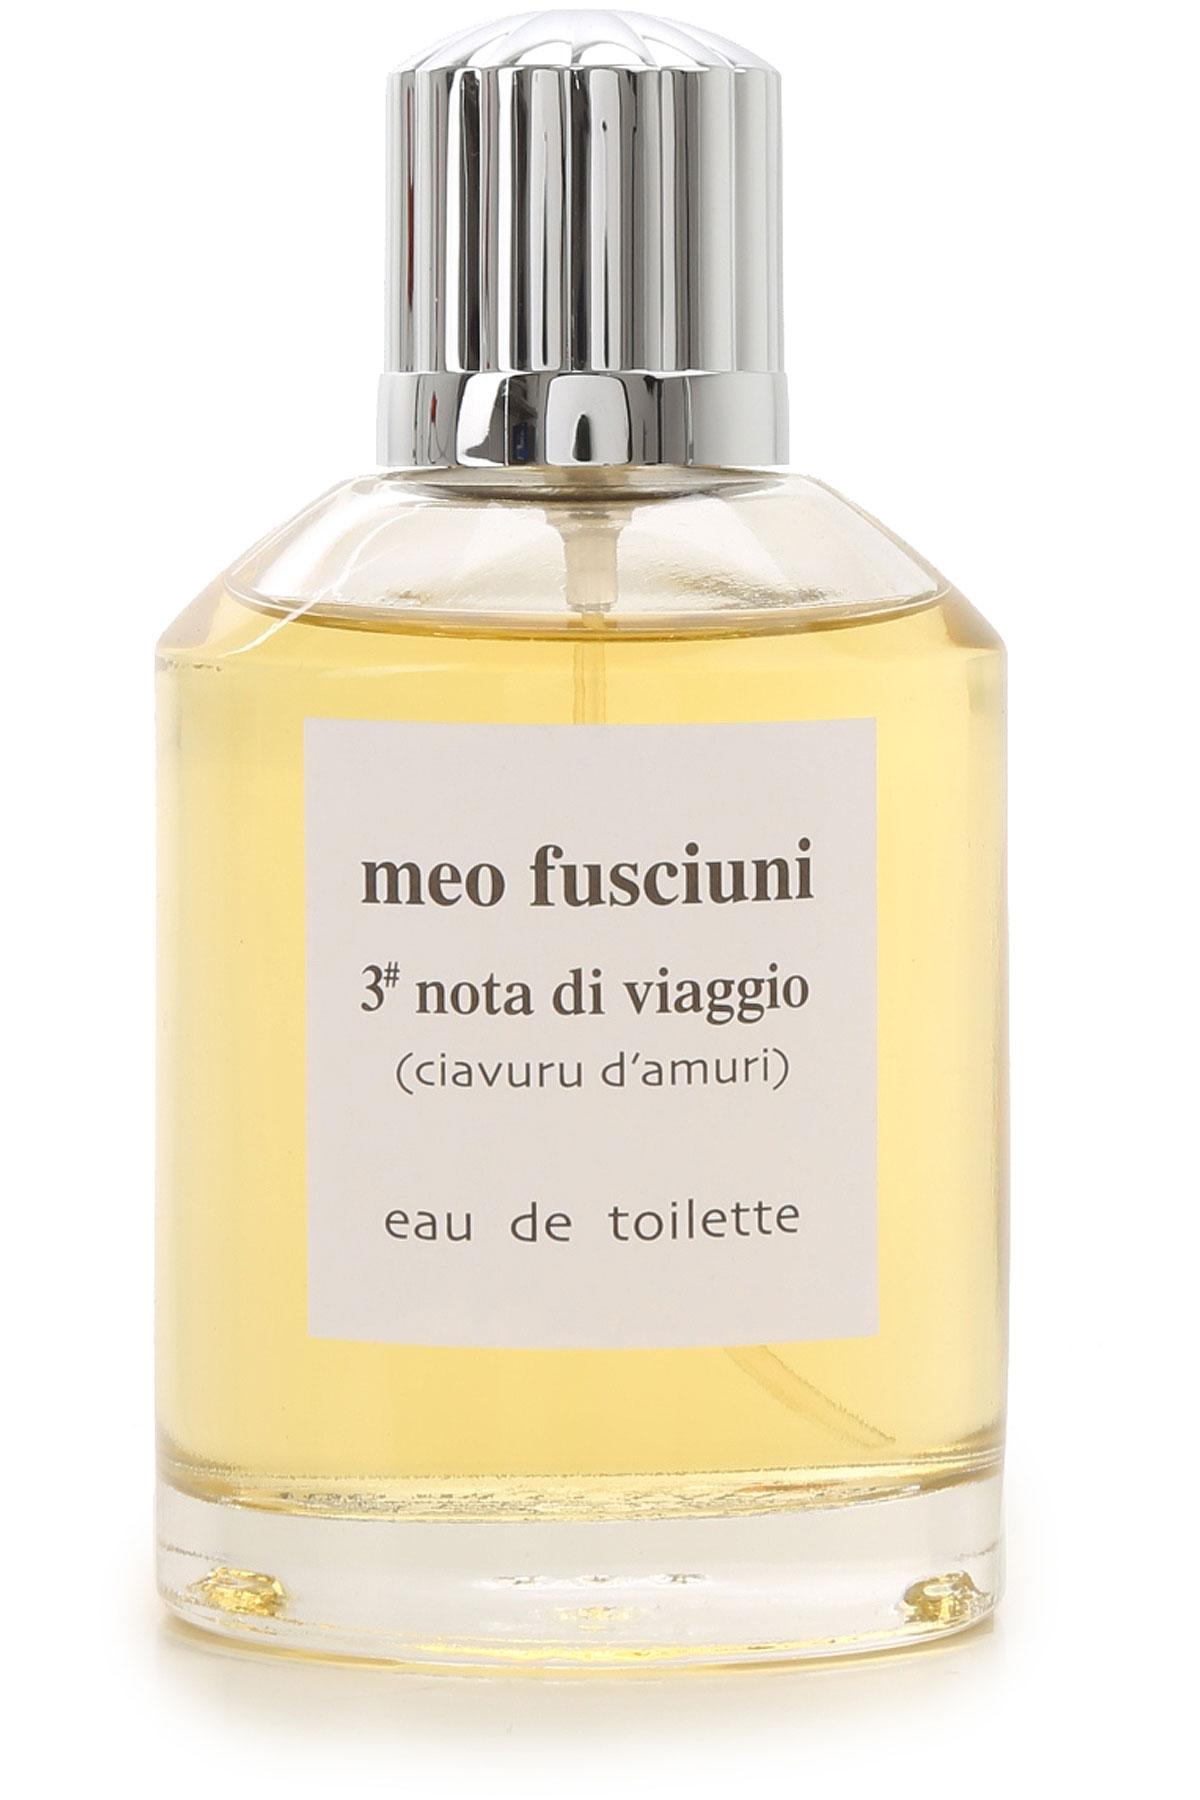 Meo Fusciuni Fragrances for Women, 3 Nota Di Viaggio - Eau De Toilette - 100 Ml, 2019, 100 ml